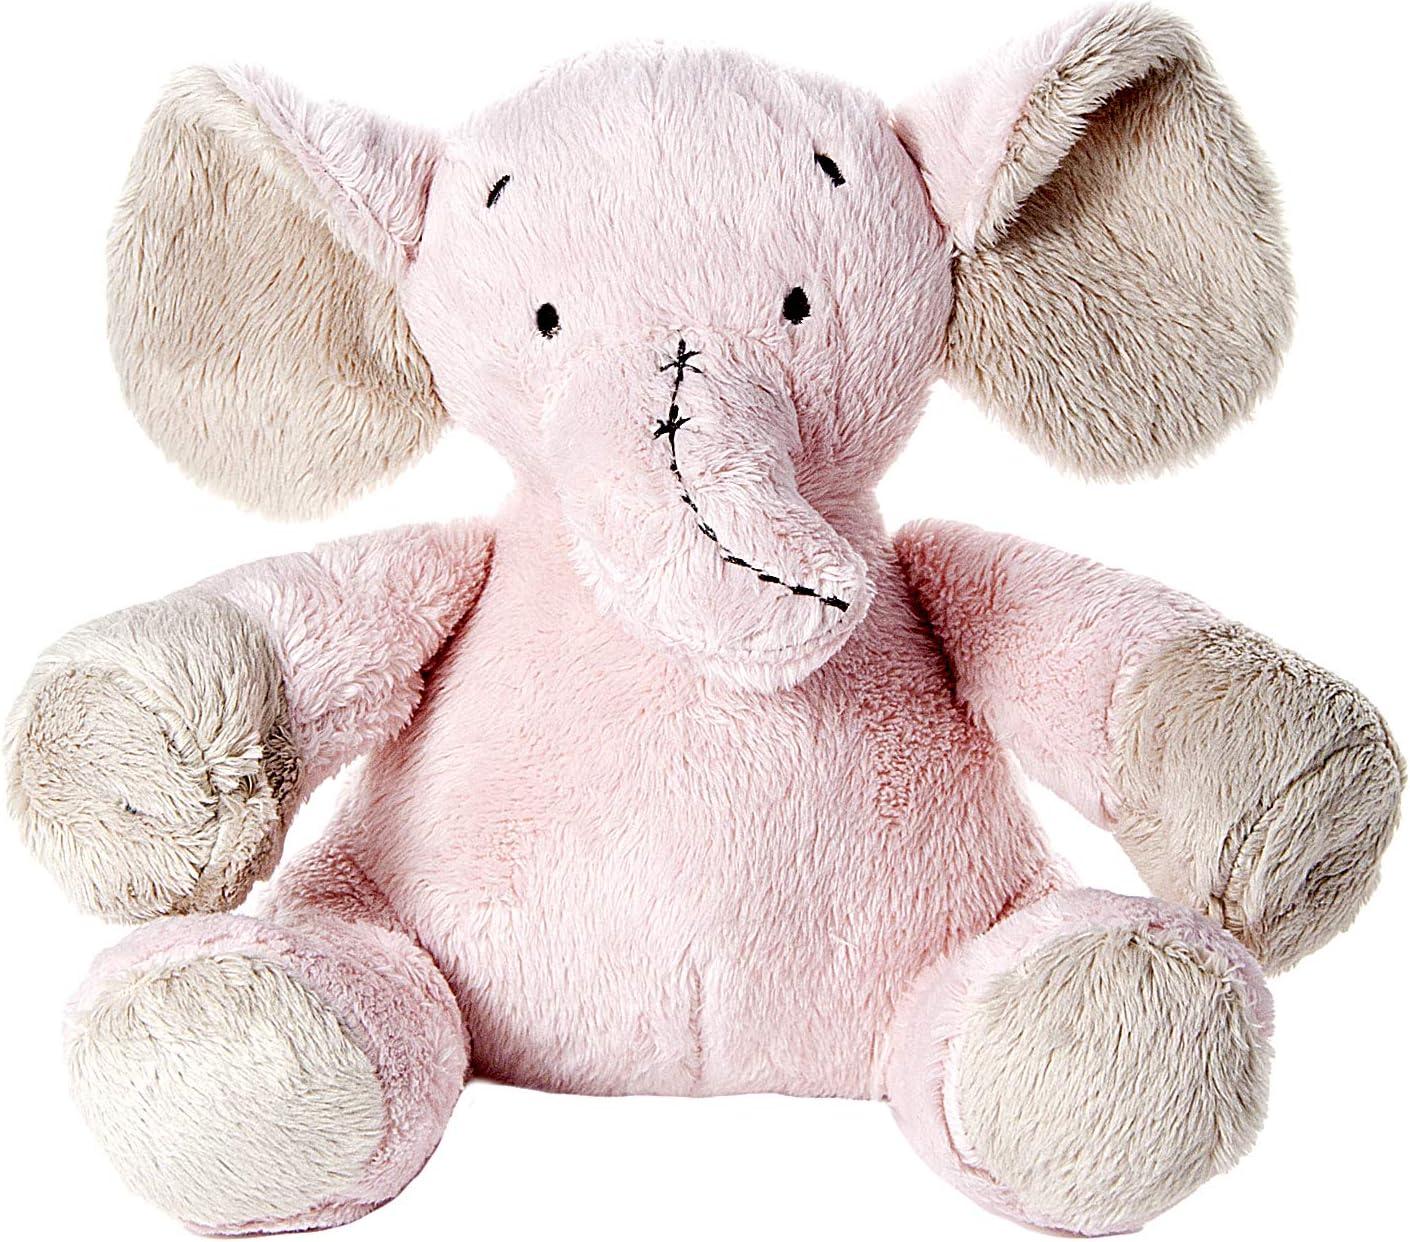 Mousehouse Gifts Animales de Peluche Juguetes Rosa Elefante para bebé recién Nacido niña